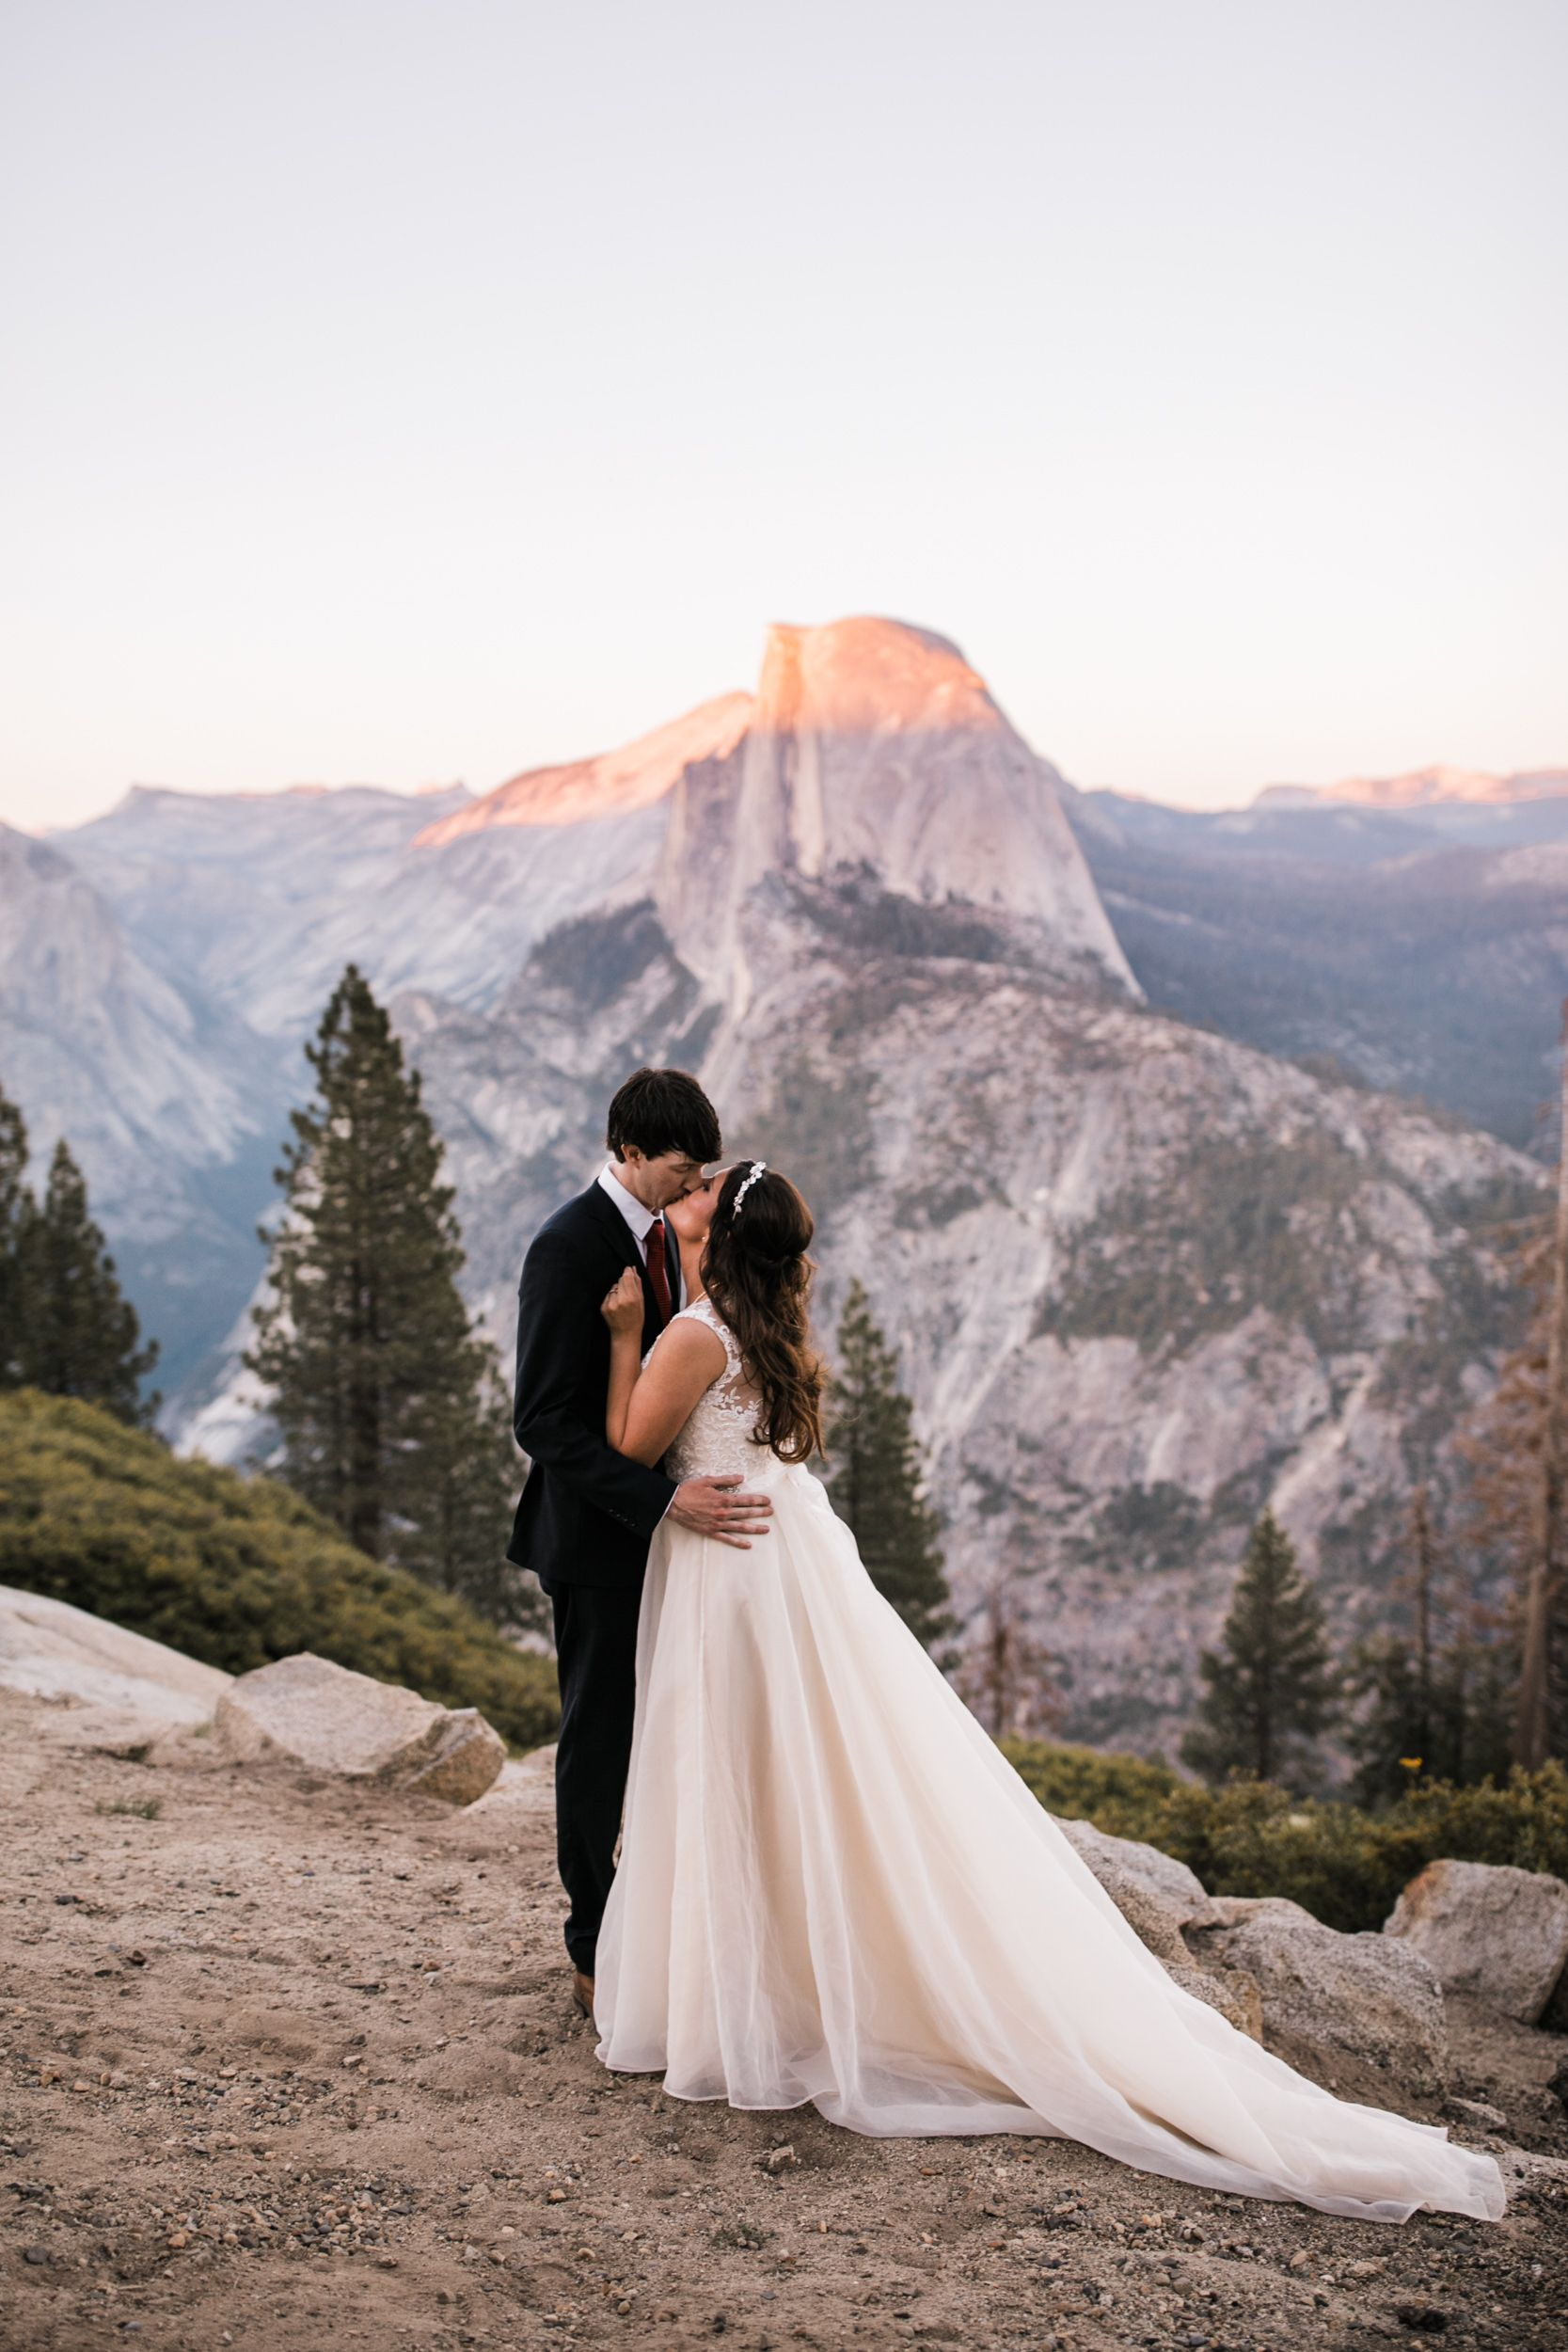 Yosemite National Park Adventure Elopement Yosemite Wedding Photographer Adventure Wedding Elopement Photographers In Moab Yosemite And Beyond The Hea Yosemite Wedding Adventure Wedding National Park Wedding